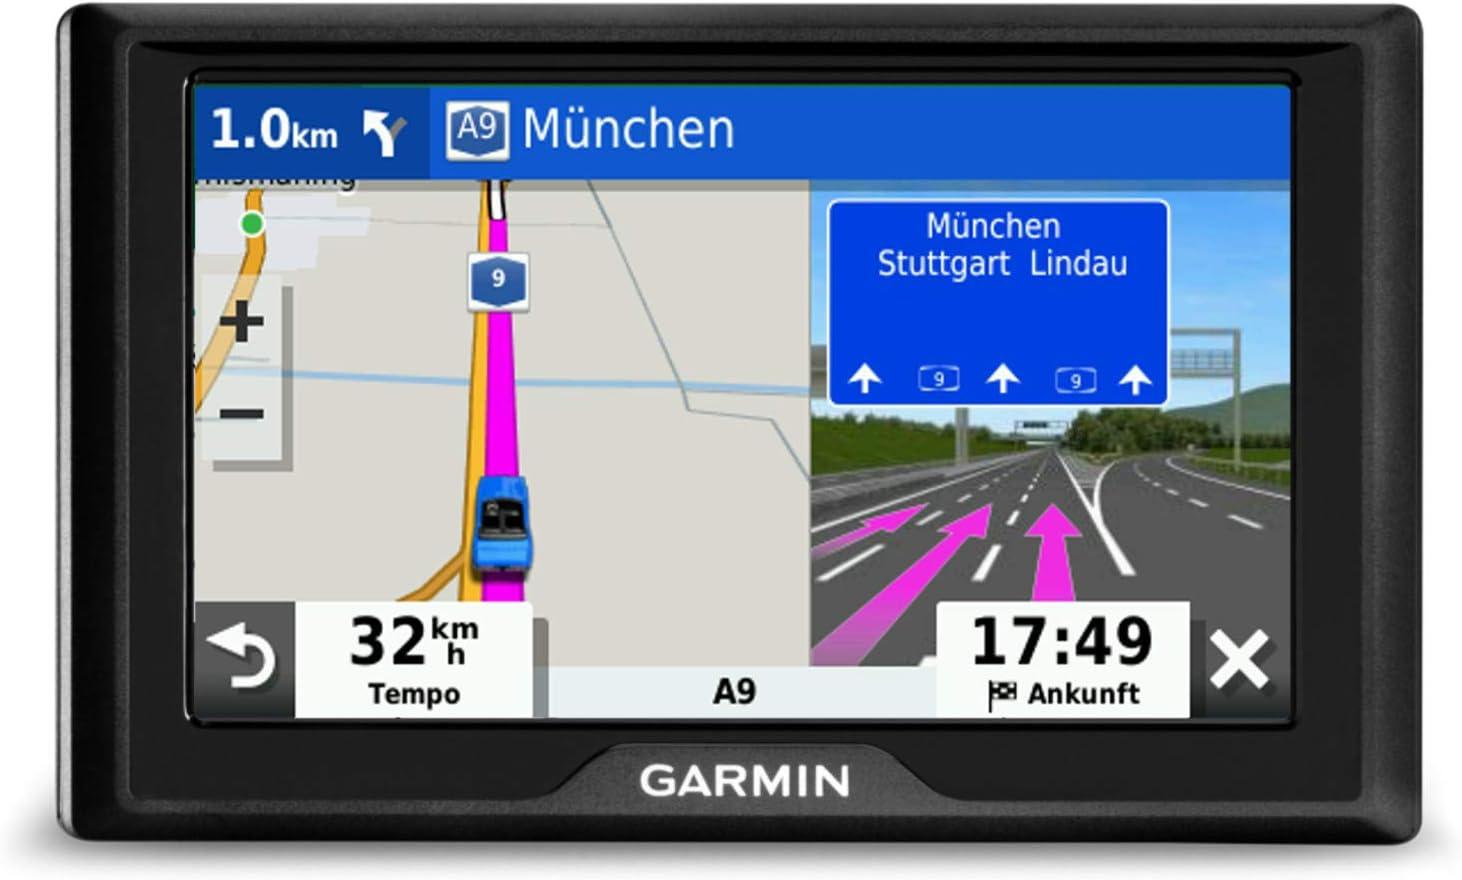 Garmin Drive 52 Eu Navi Rds Europakarten 5 Zoll Display Sicherheitspaket Parkplatzsuche Tripadvisor Pois Navigation